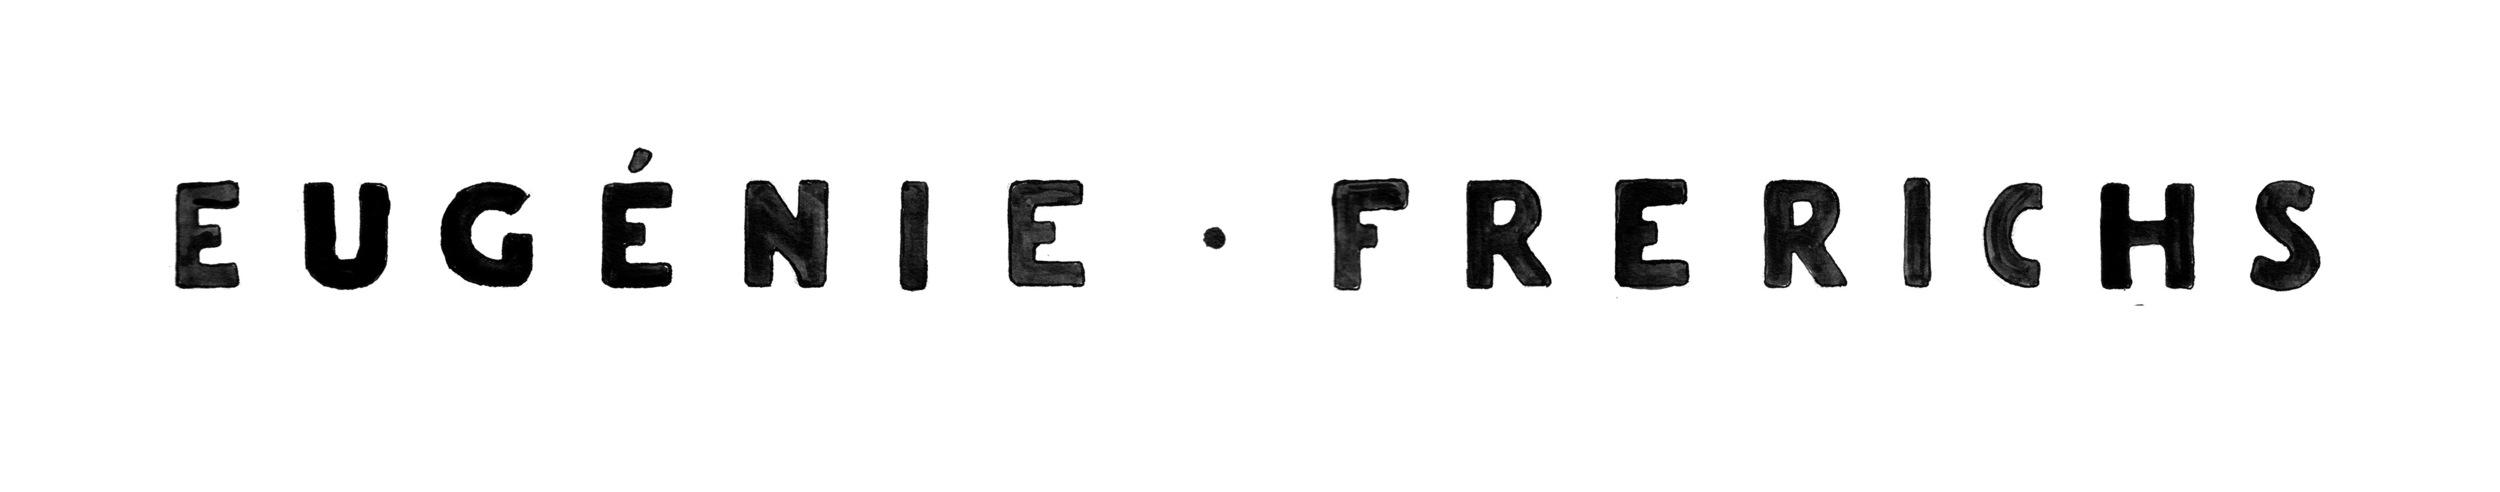 ELF012.jpg